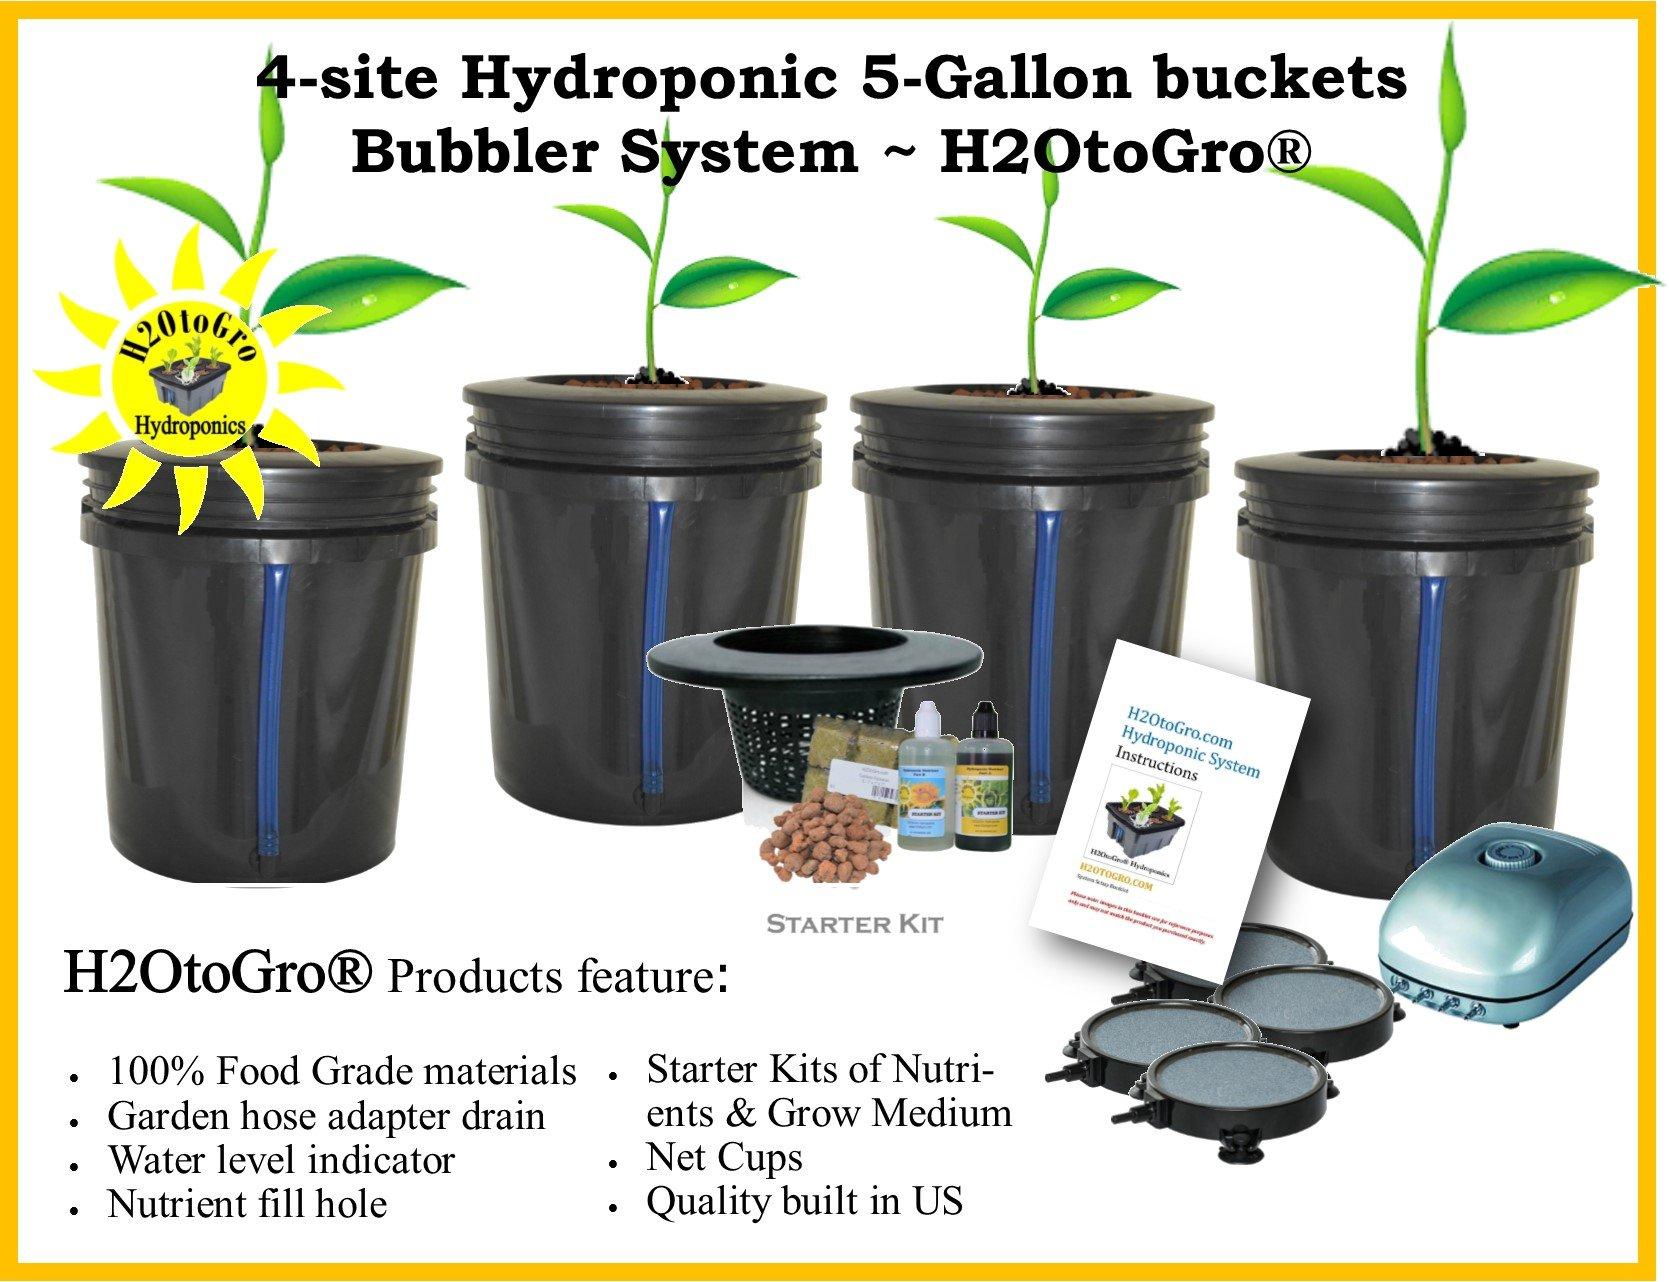 DWC 4-site Hydroponic Bucket BUBBLER Grow kit by H2OToGro (Image #1)